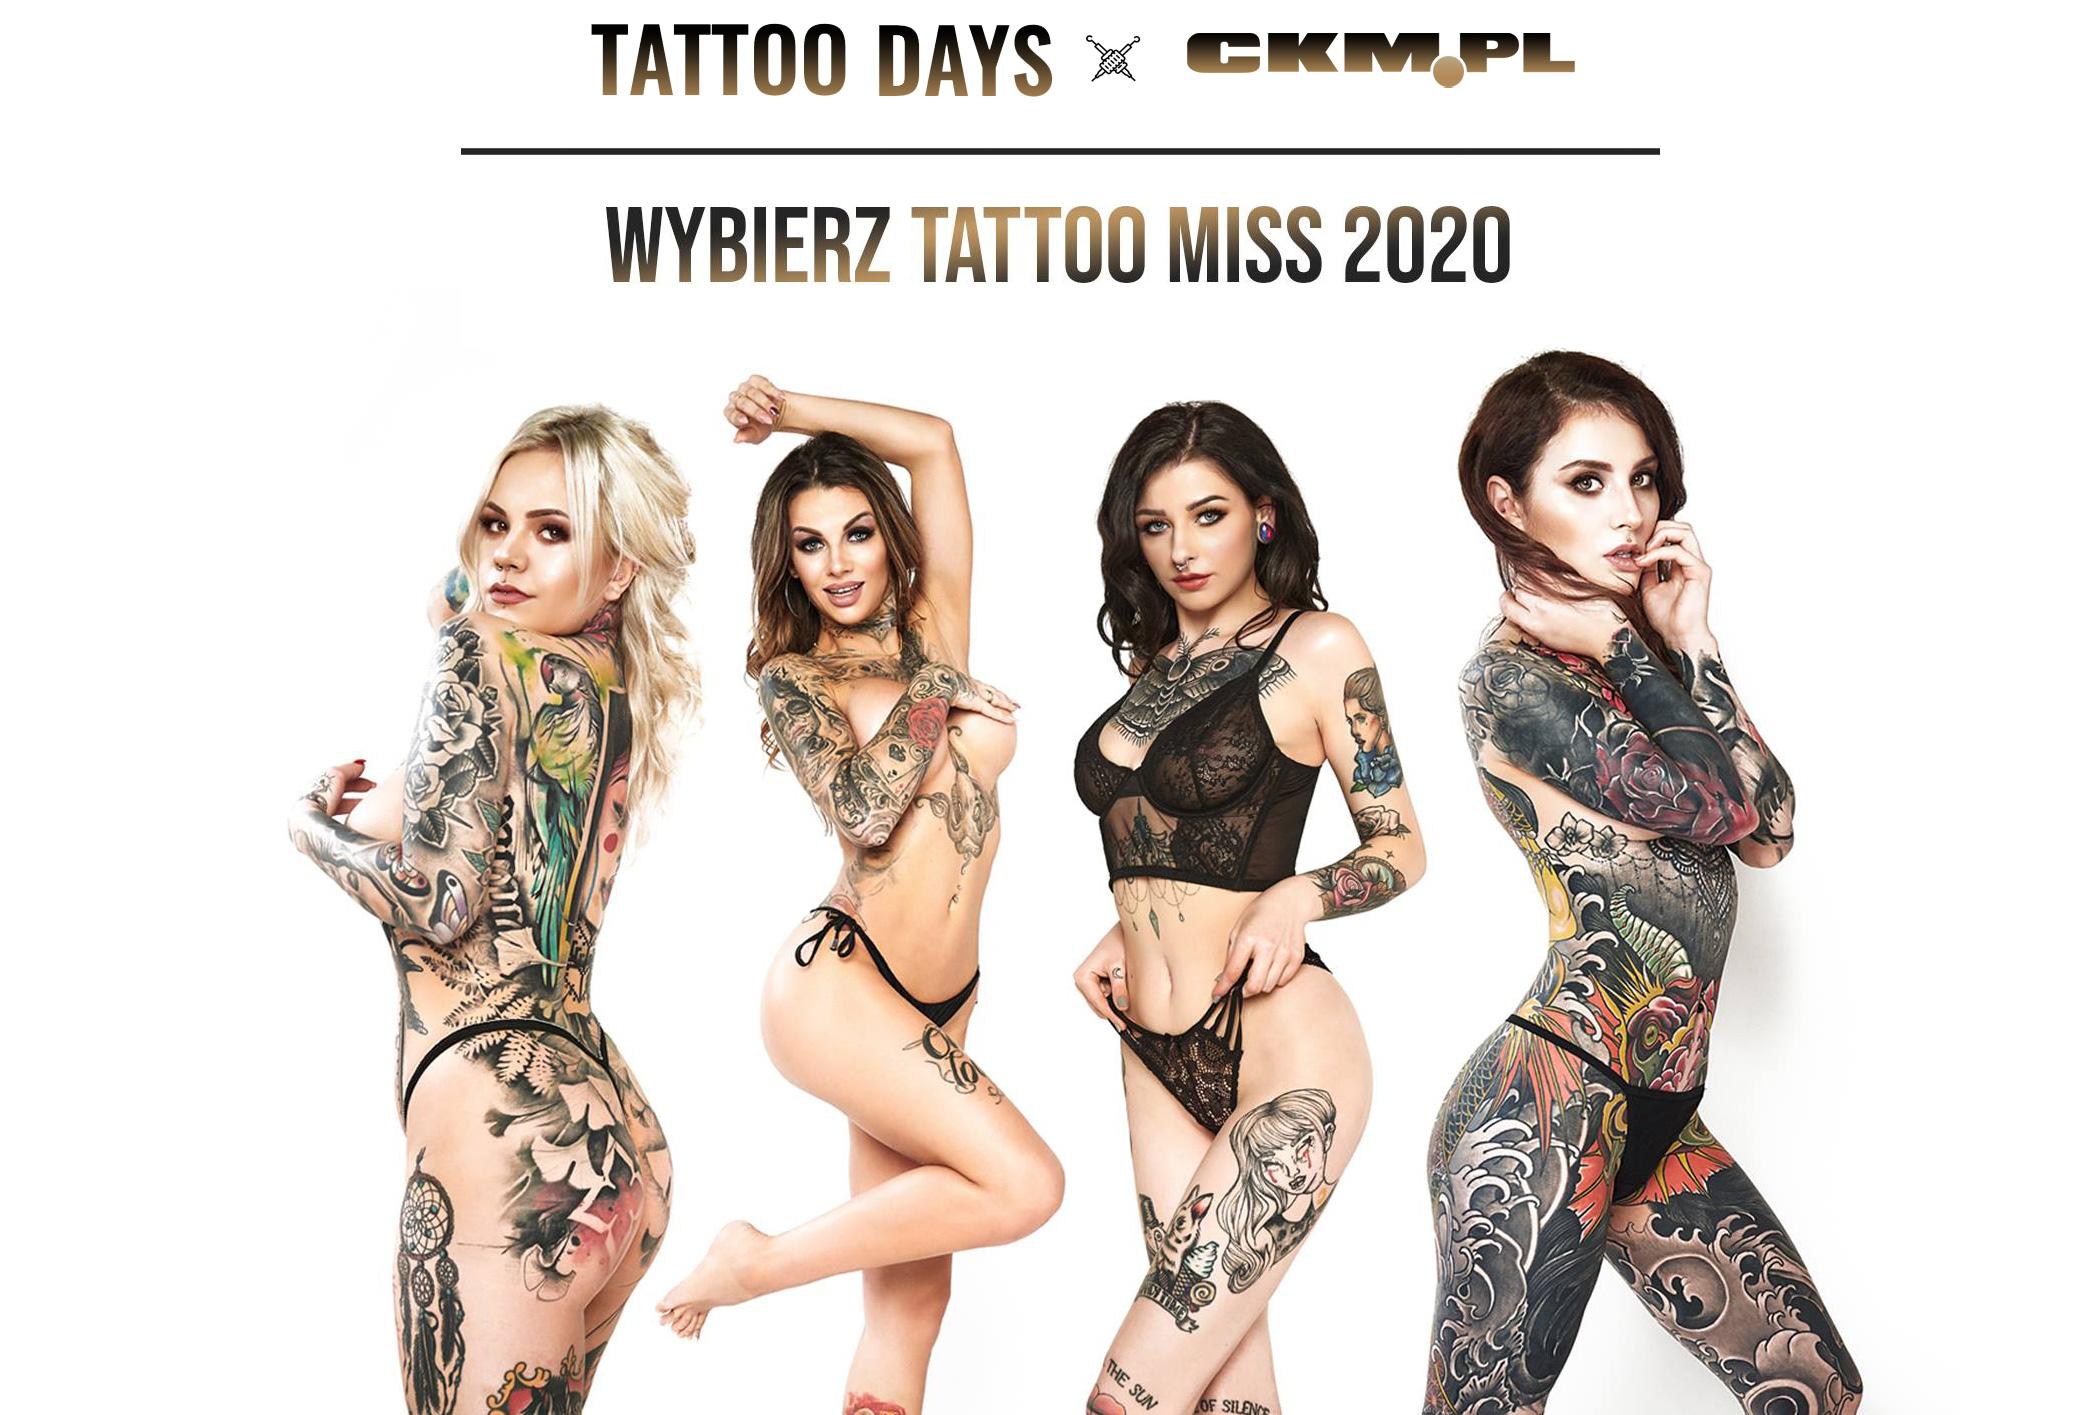 tattoo-gl-8f03eb18eb843ef6c6b2ef9f059dd86e_3bf286.jpg